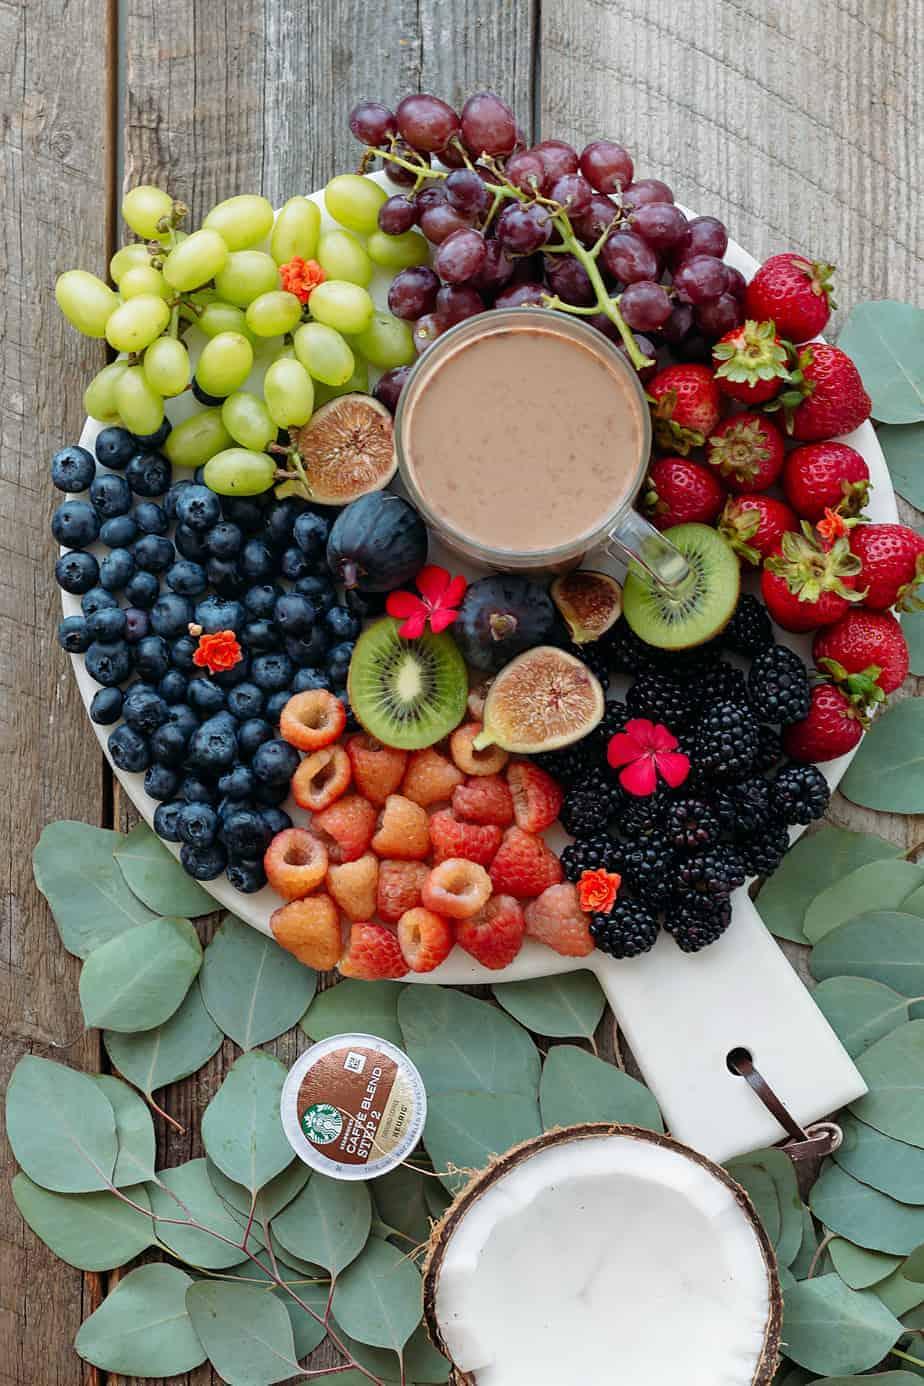 breakfast-fruits-starbucks-caffee-latte-004